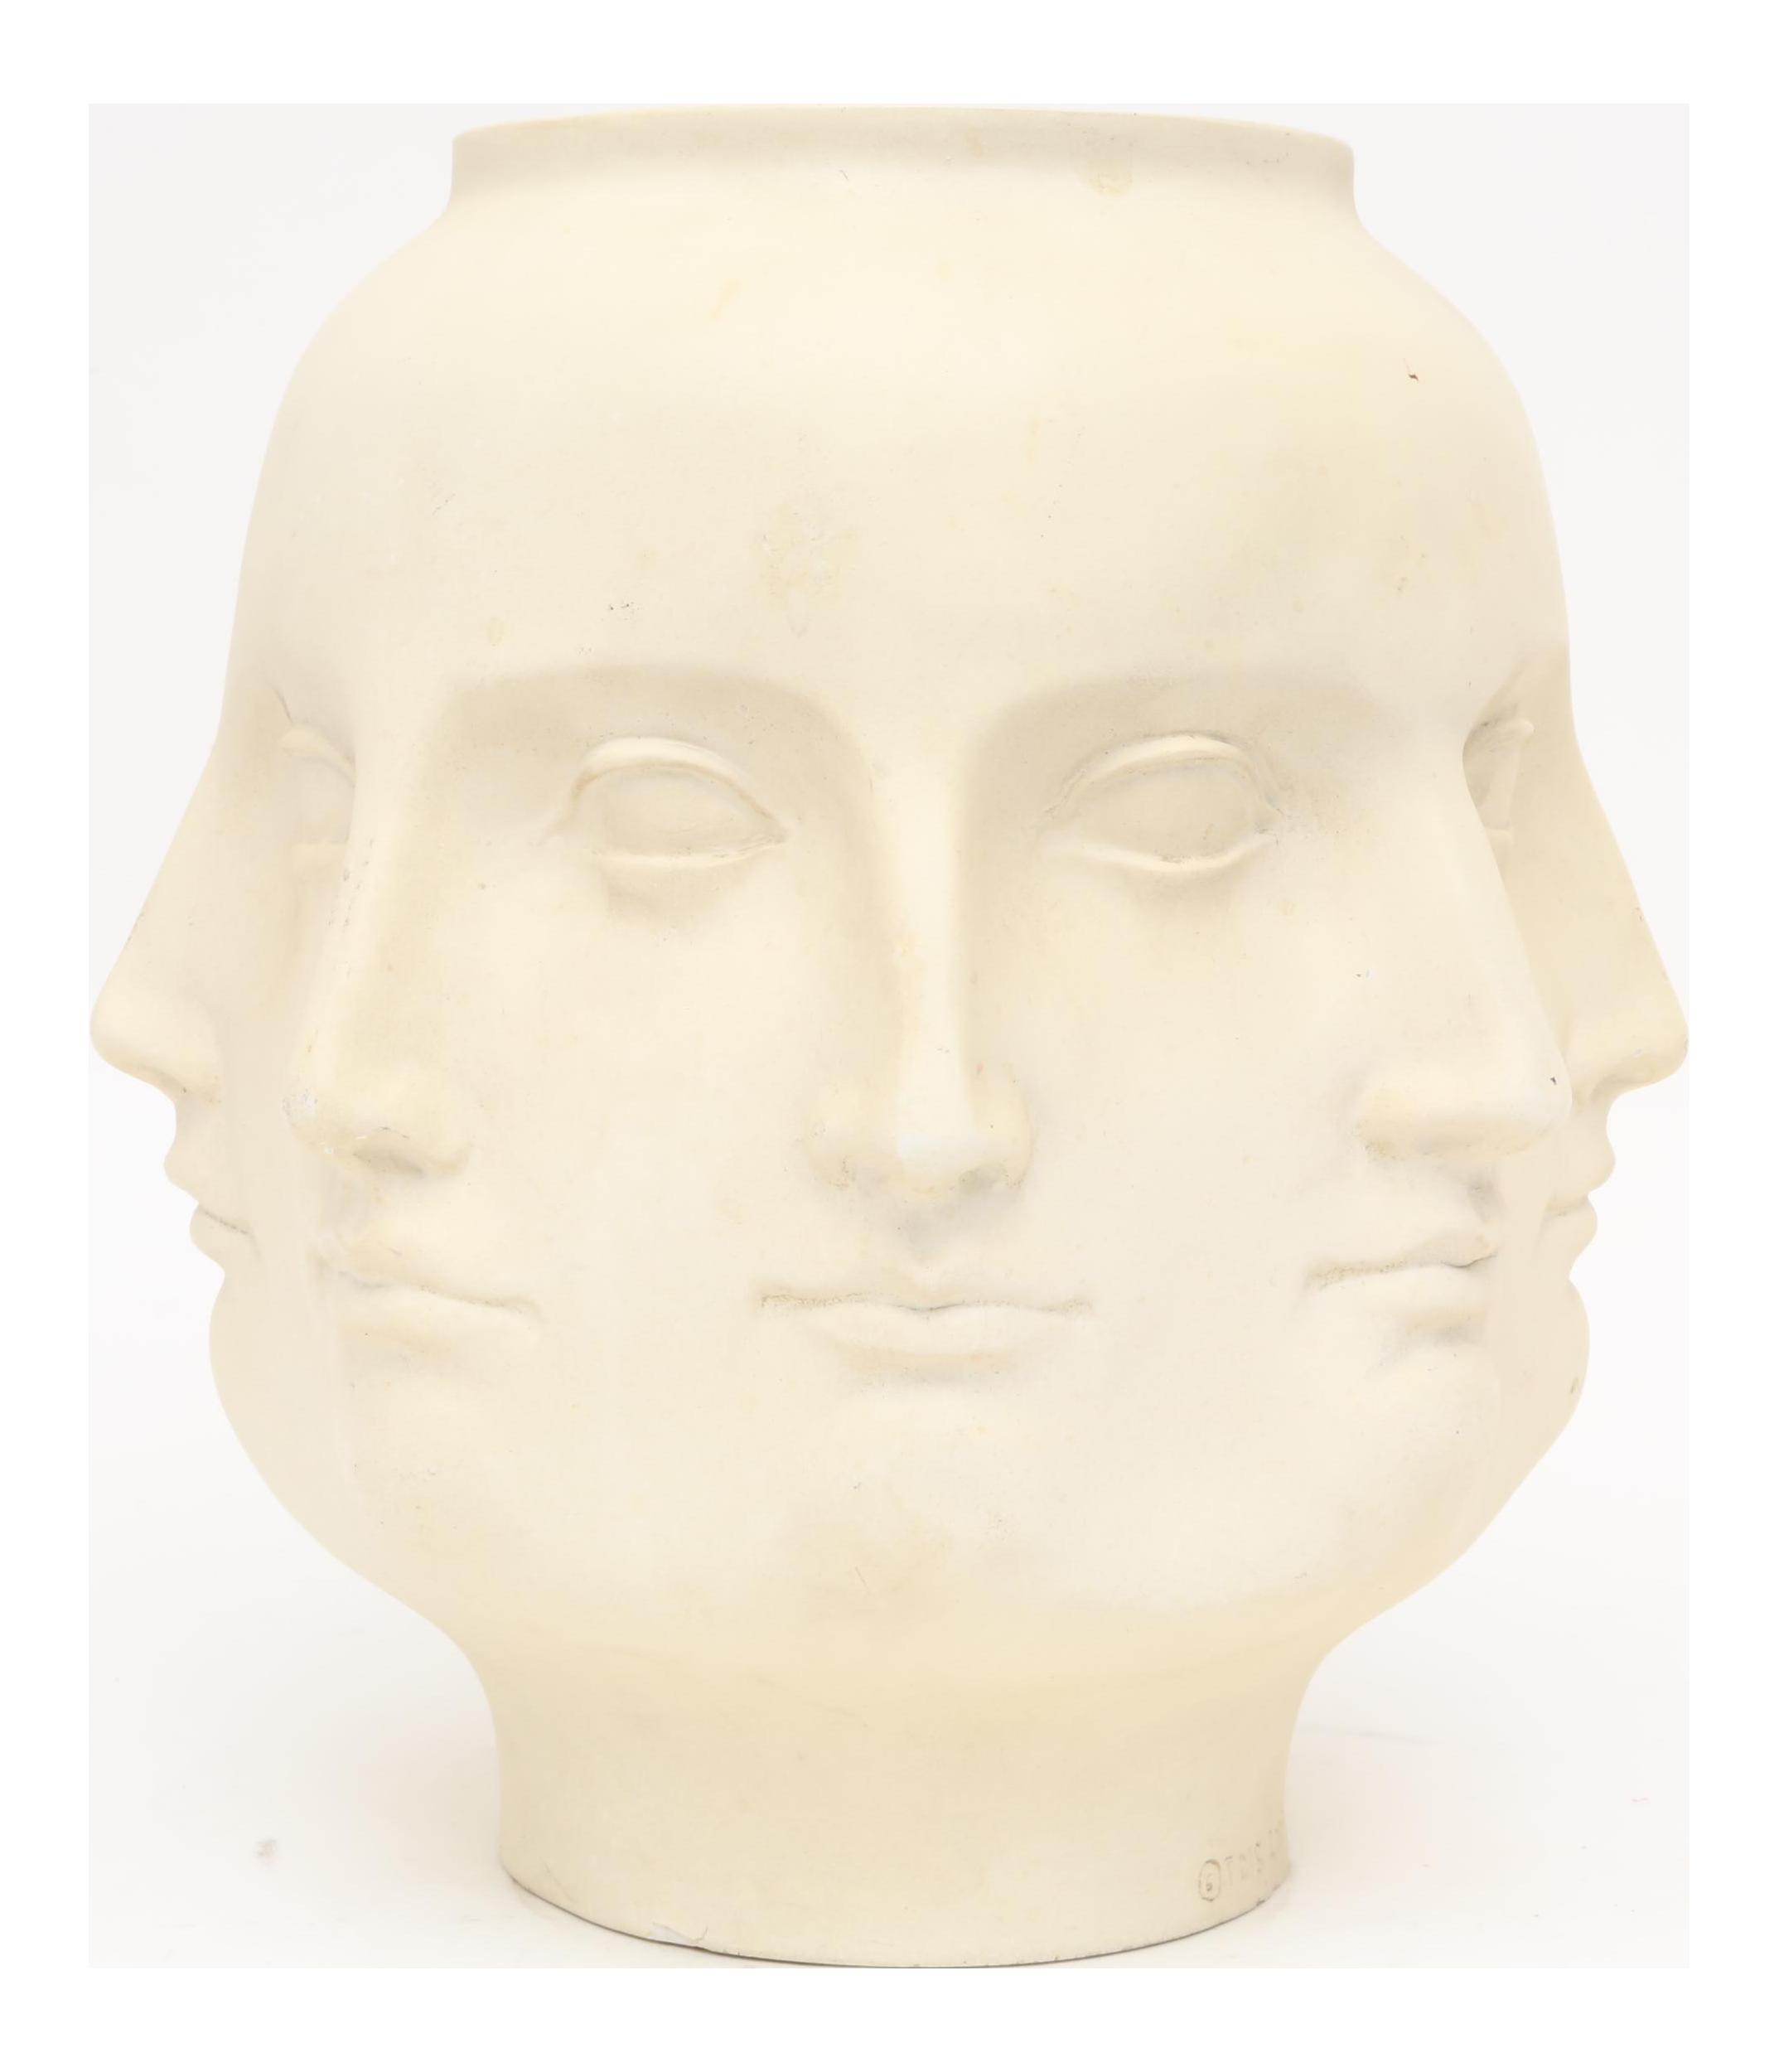 2005 tms fornasetti style perpetual dora mara face vase chairish reviewsmspy